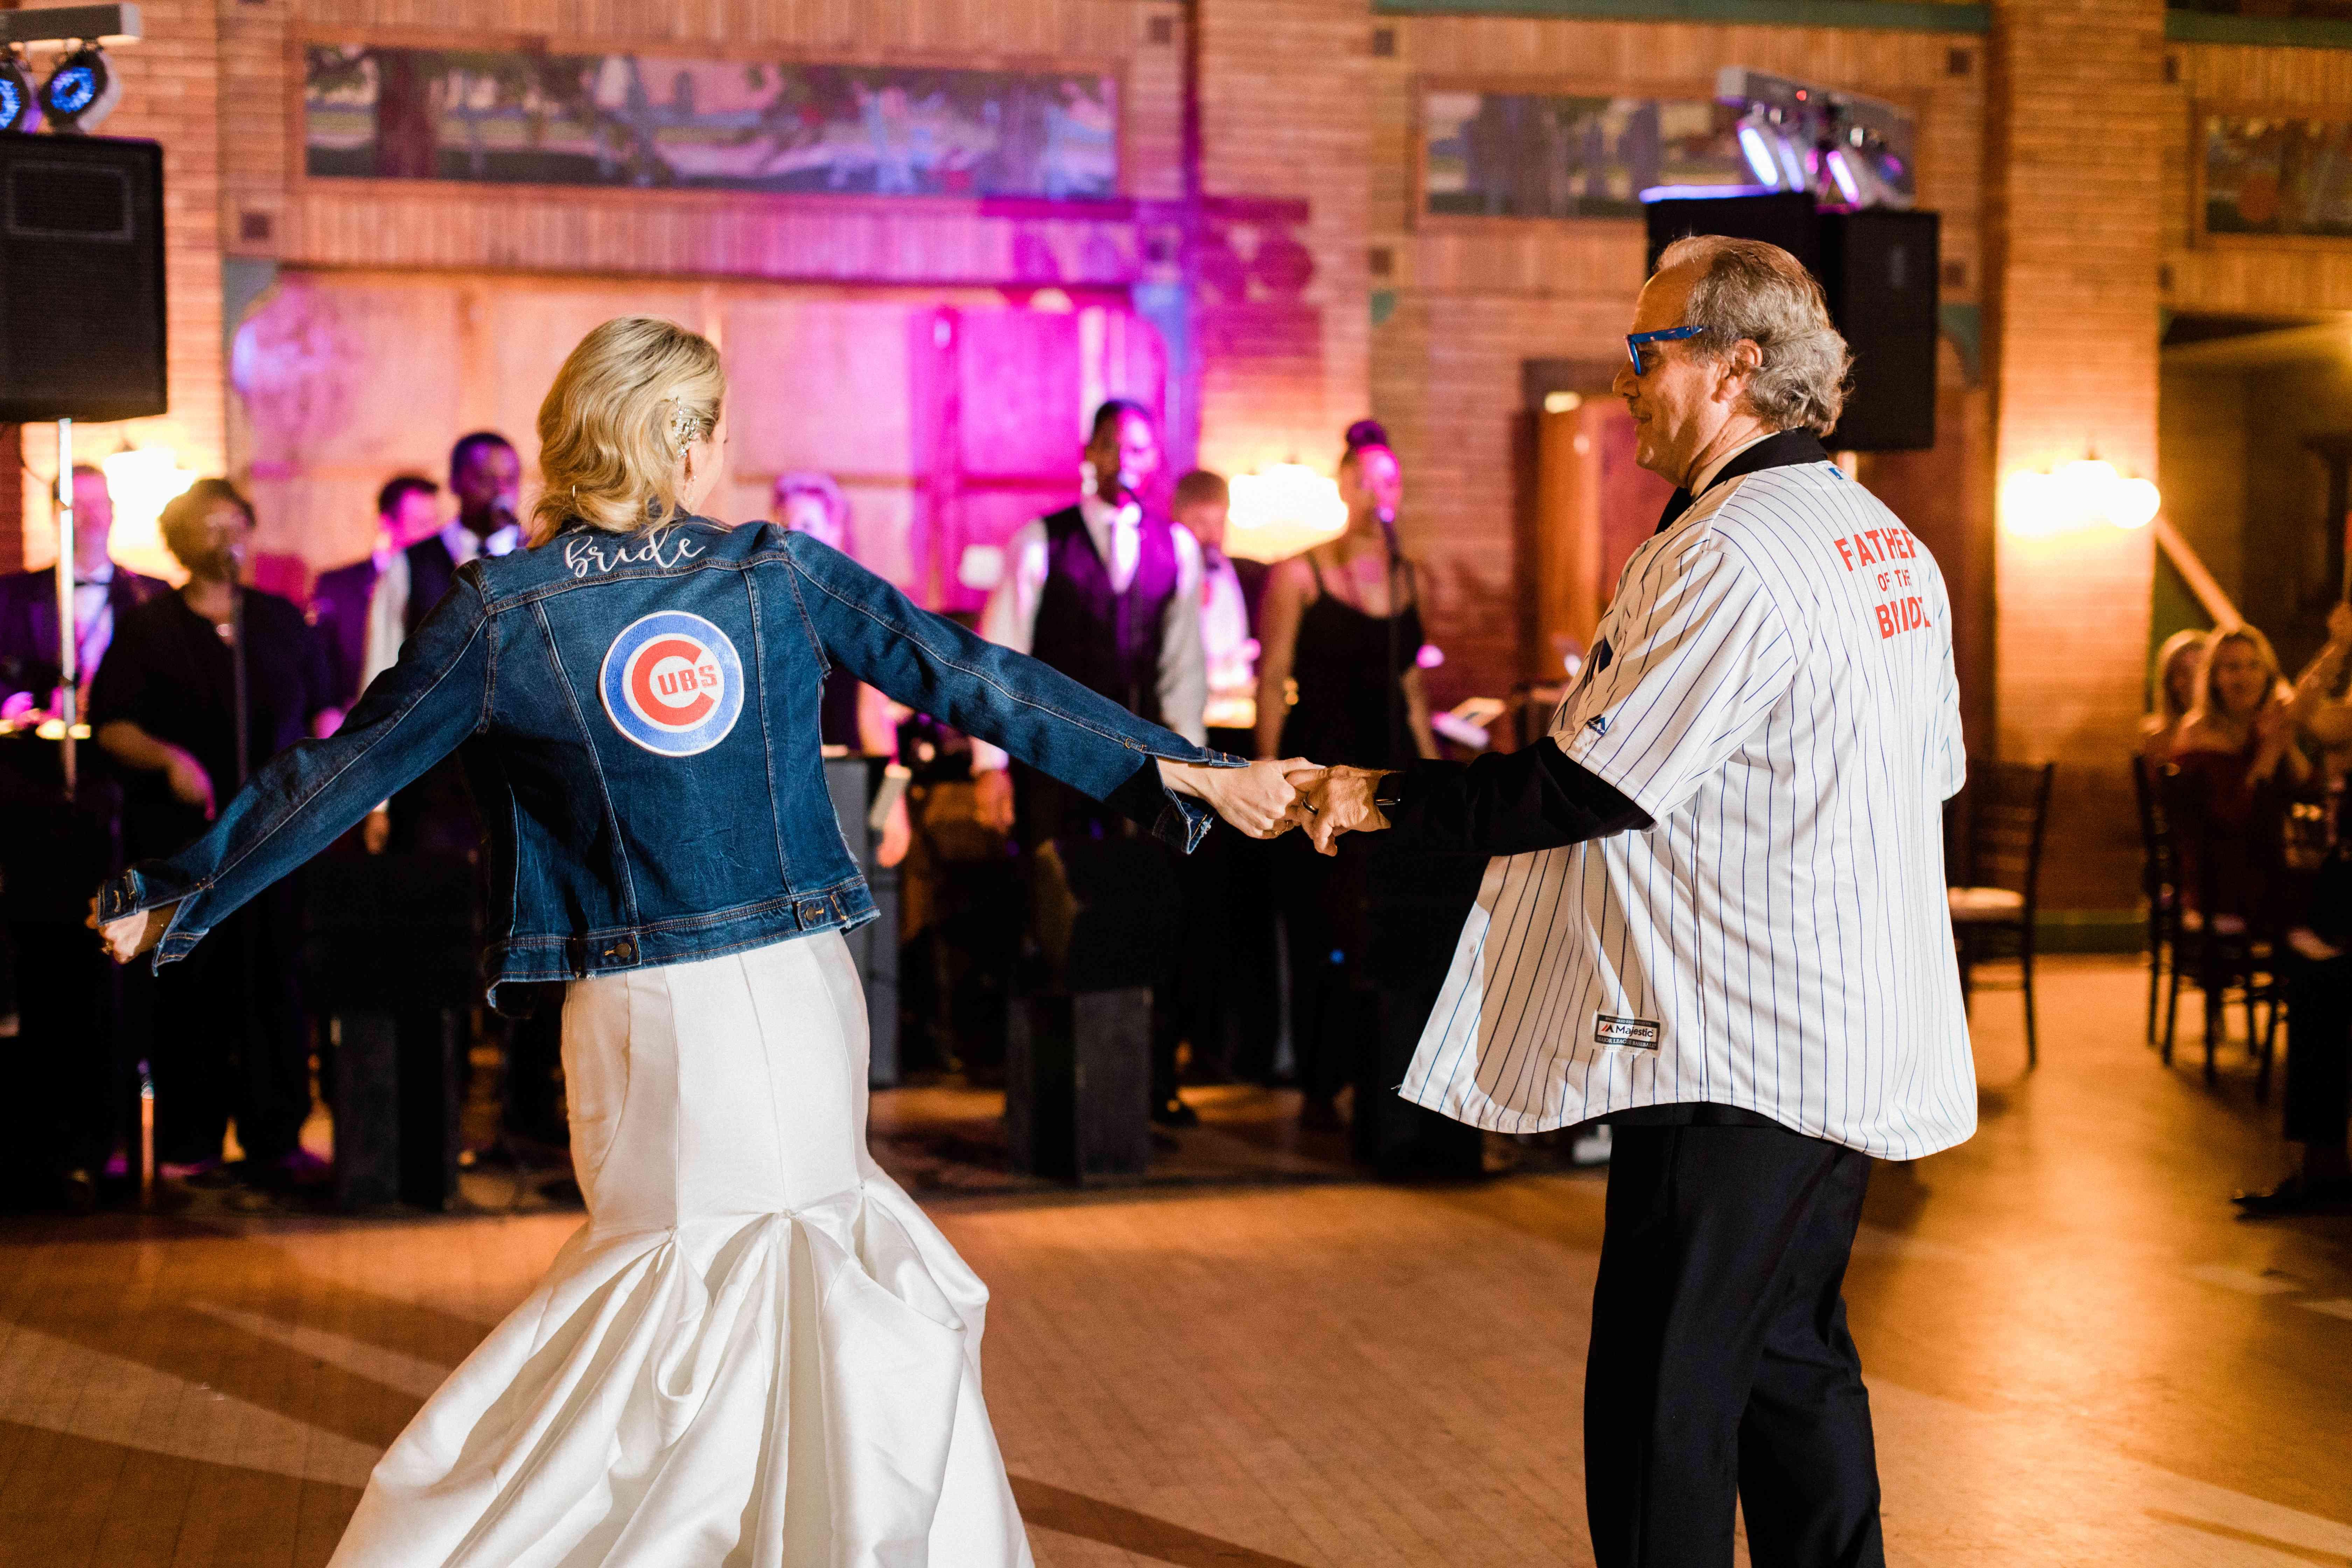 <p>Bride dancing in cubs jacket</p><br><br>